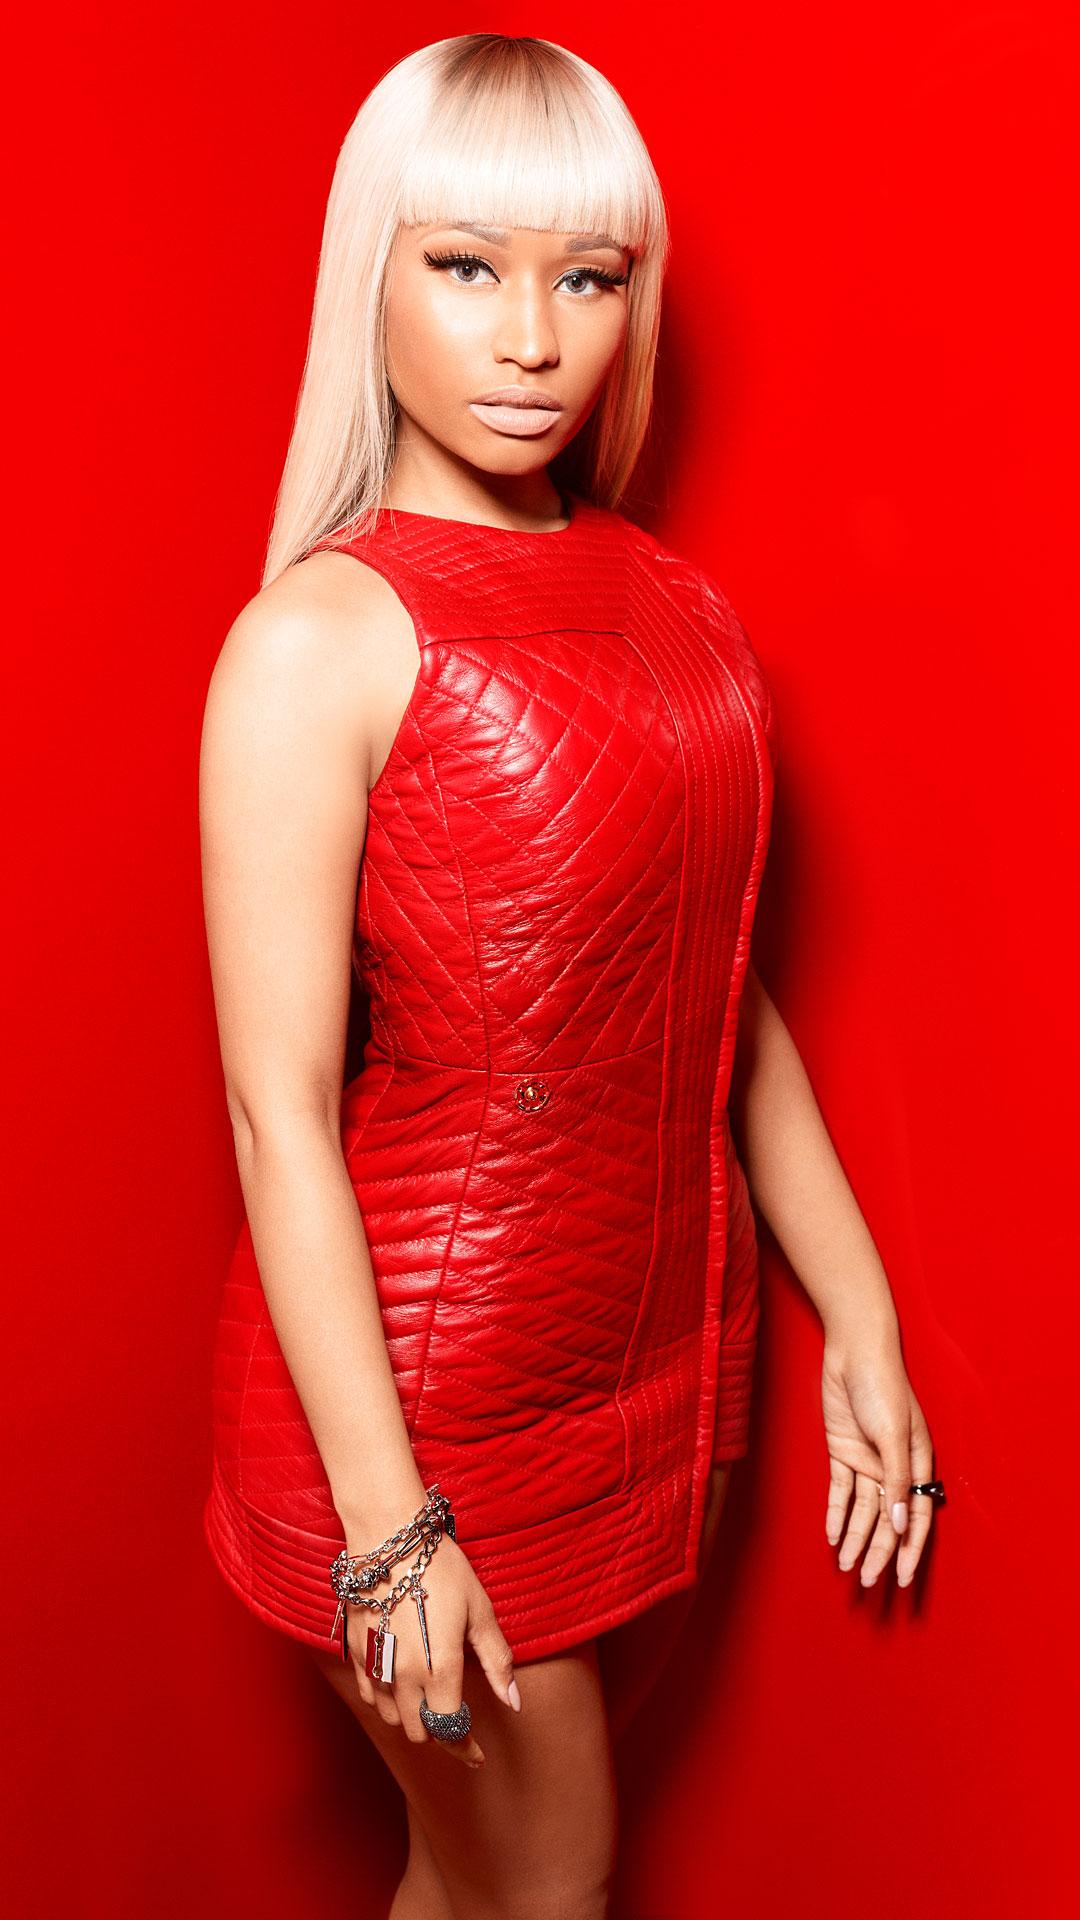 Nicki Minaj Photo Shoots